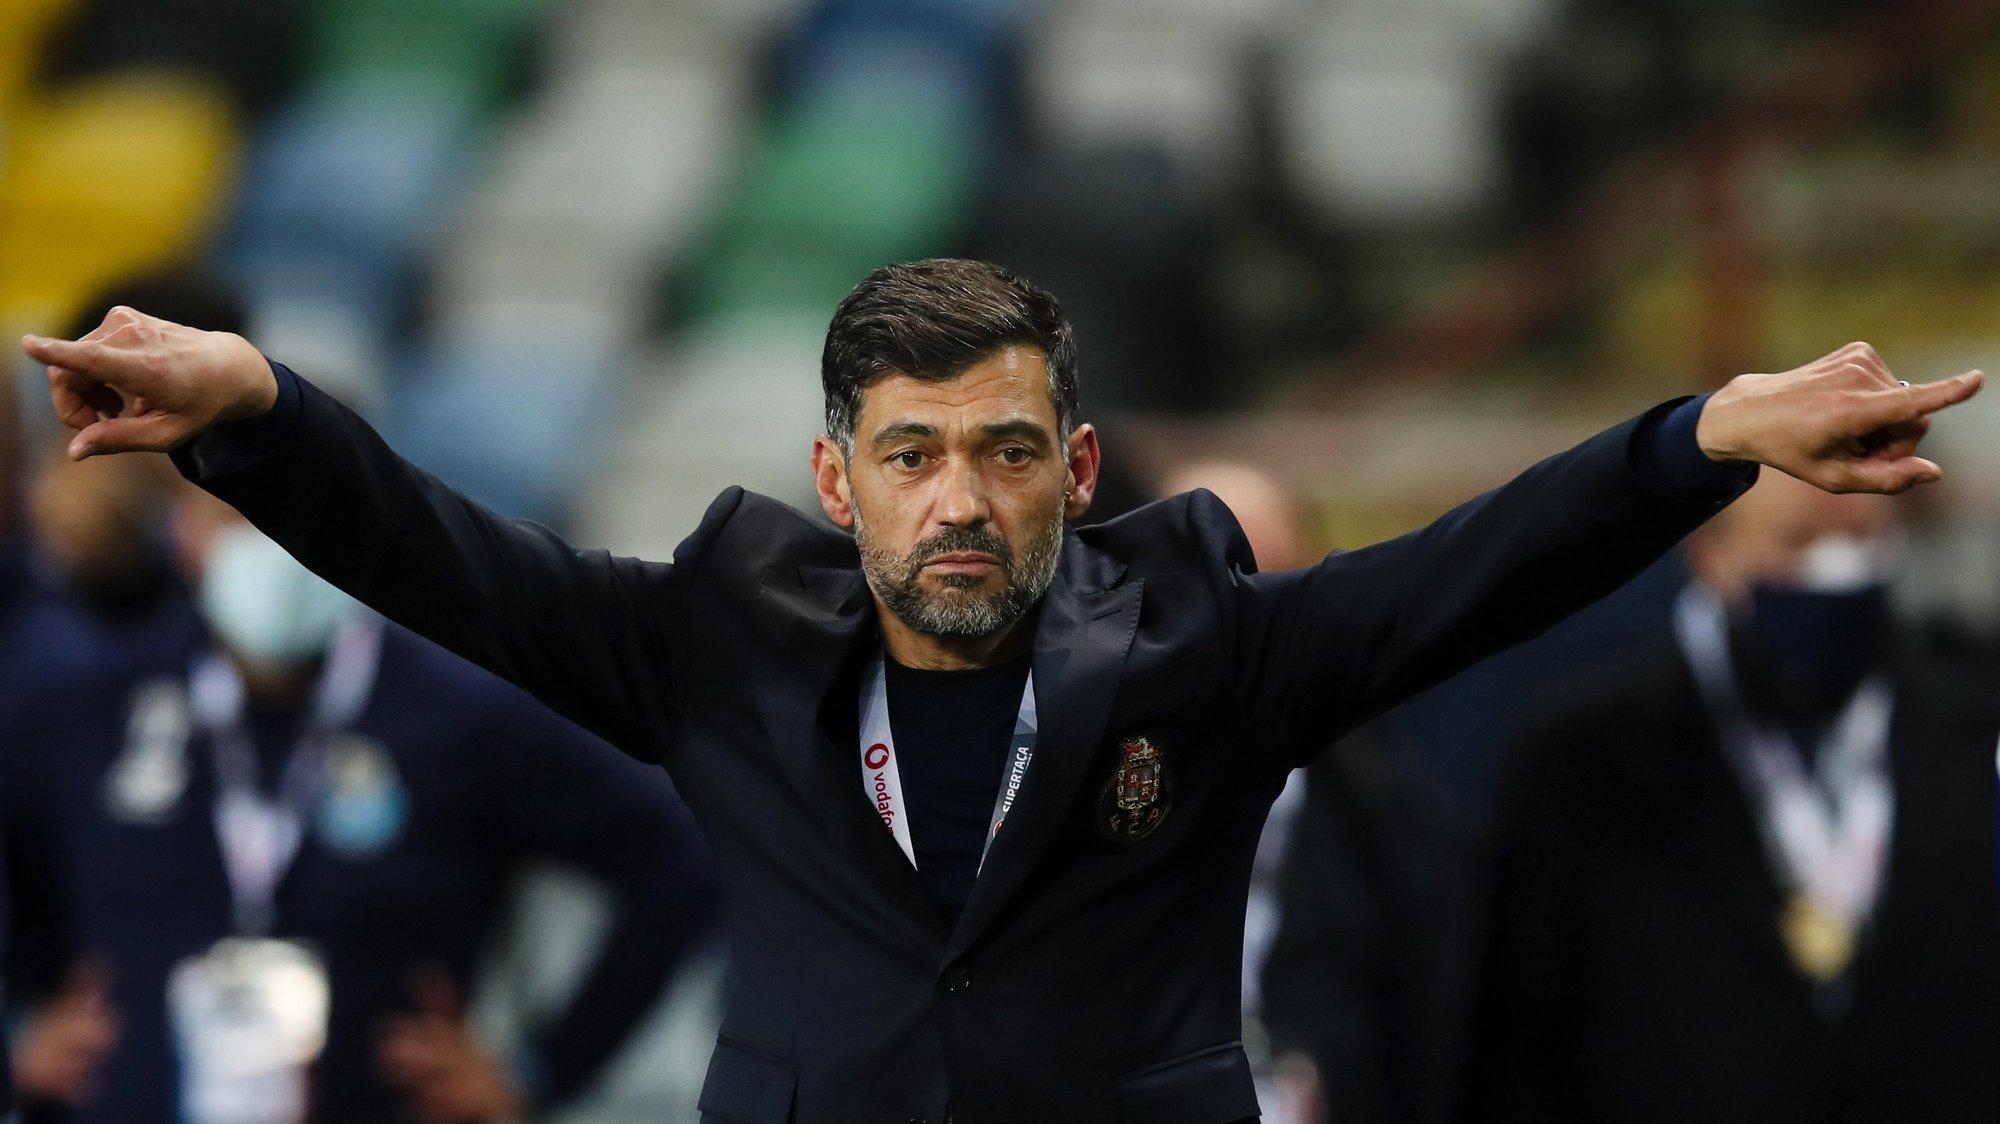 FC Porto's head coach Sergio Conceicao celebrates after winning the Portuguese Candido de Oliveira Supercup soccer match against Benfica (2-0), held at Aveiro Municipal Stadium, in Aveiro, Portugal, 23 December 2020. JOSE COELHO/LUSA